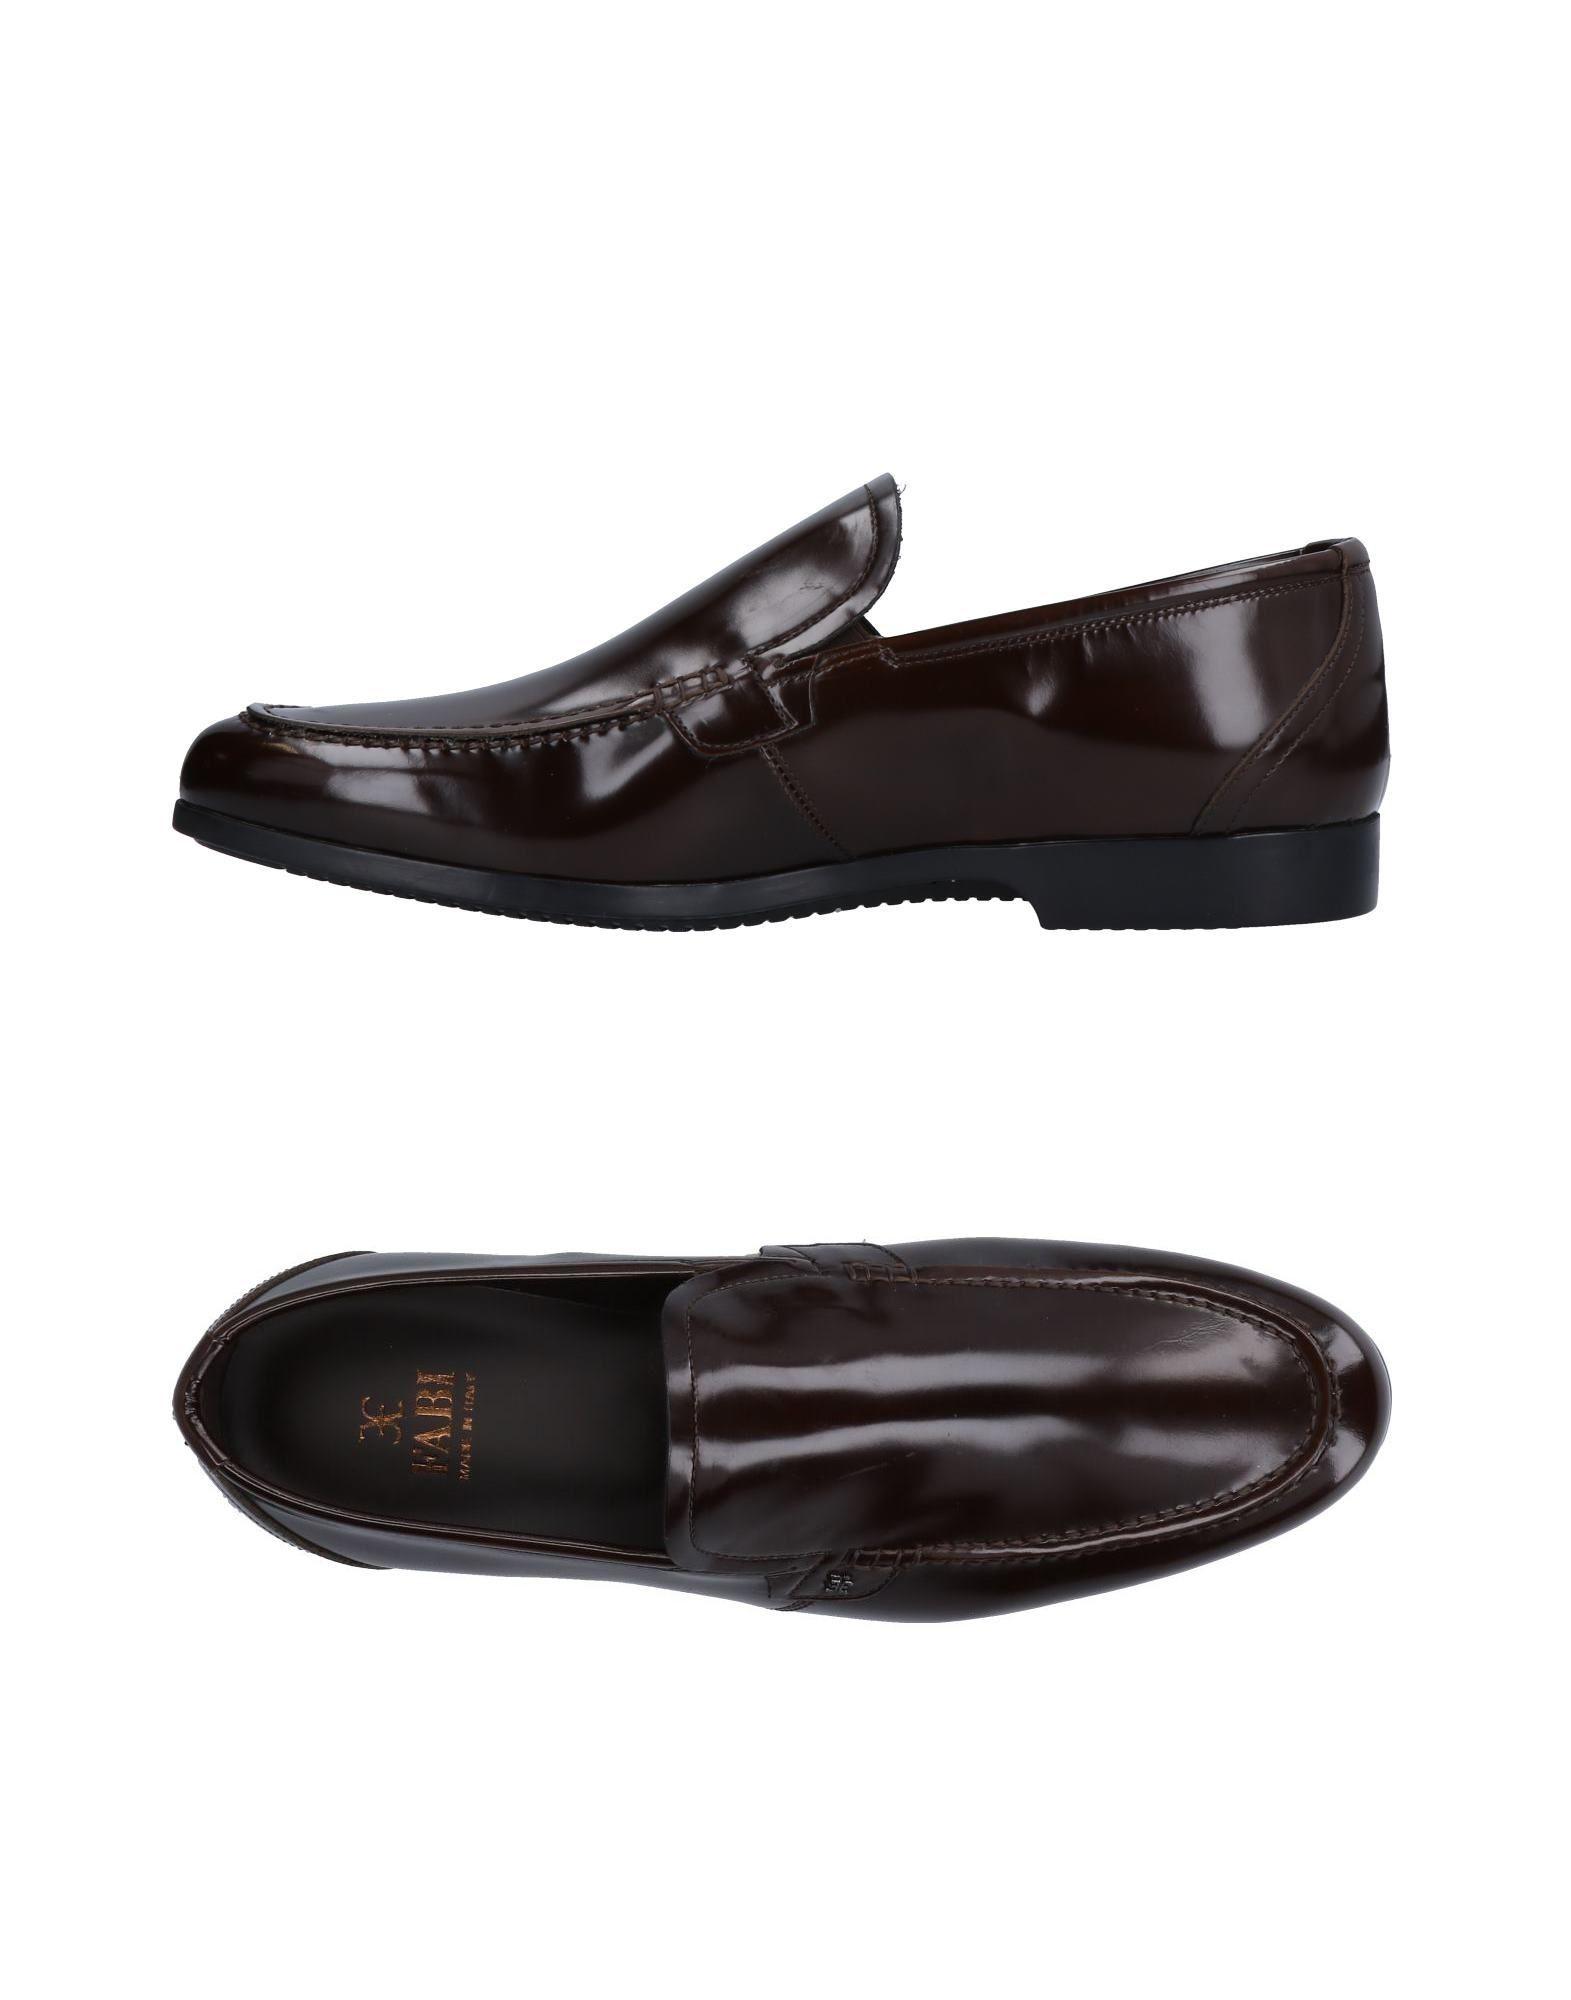 Fabi Mokassins Herren  11515651DC Gute Qualität beliebte Schuhe